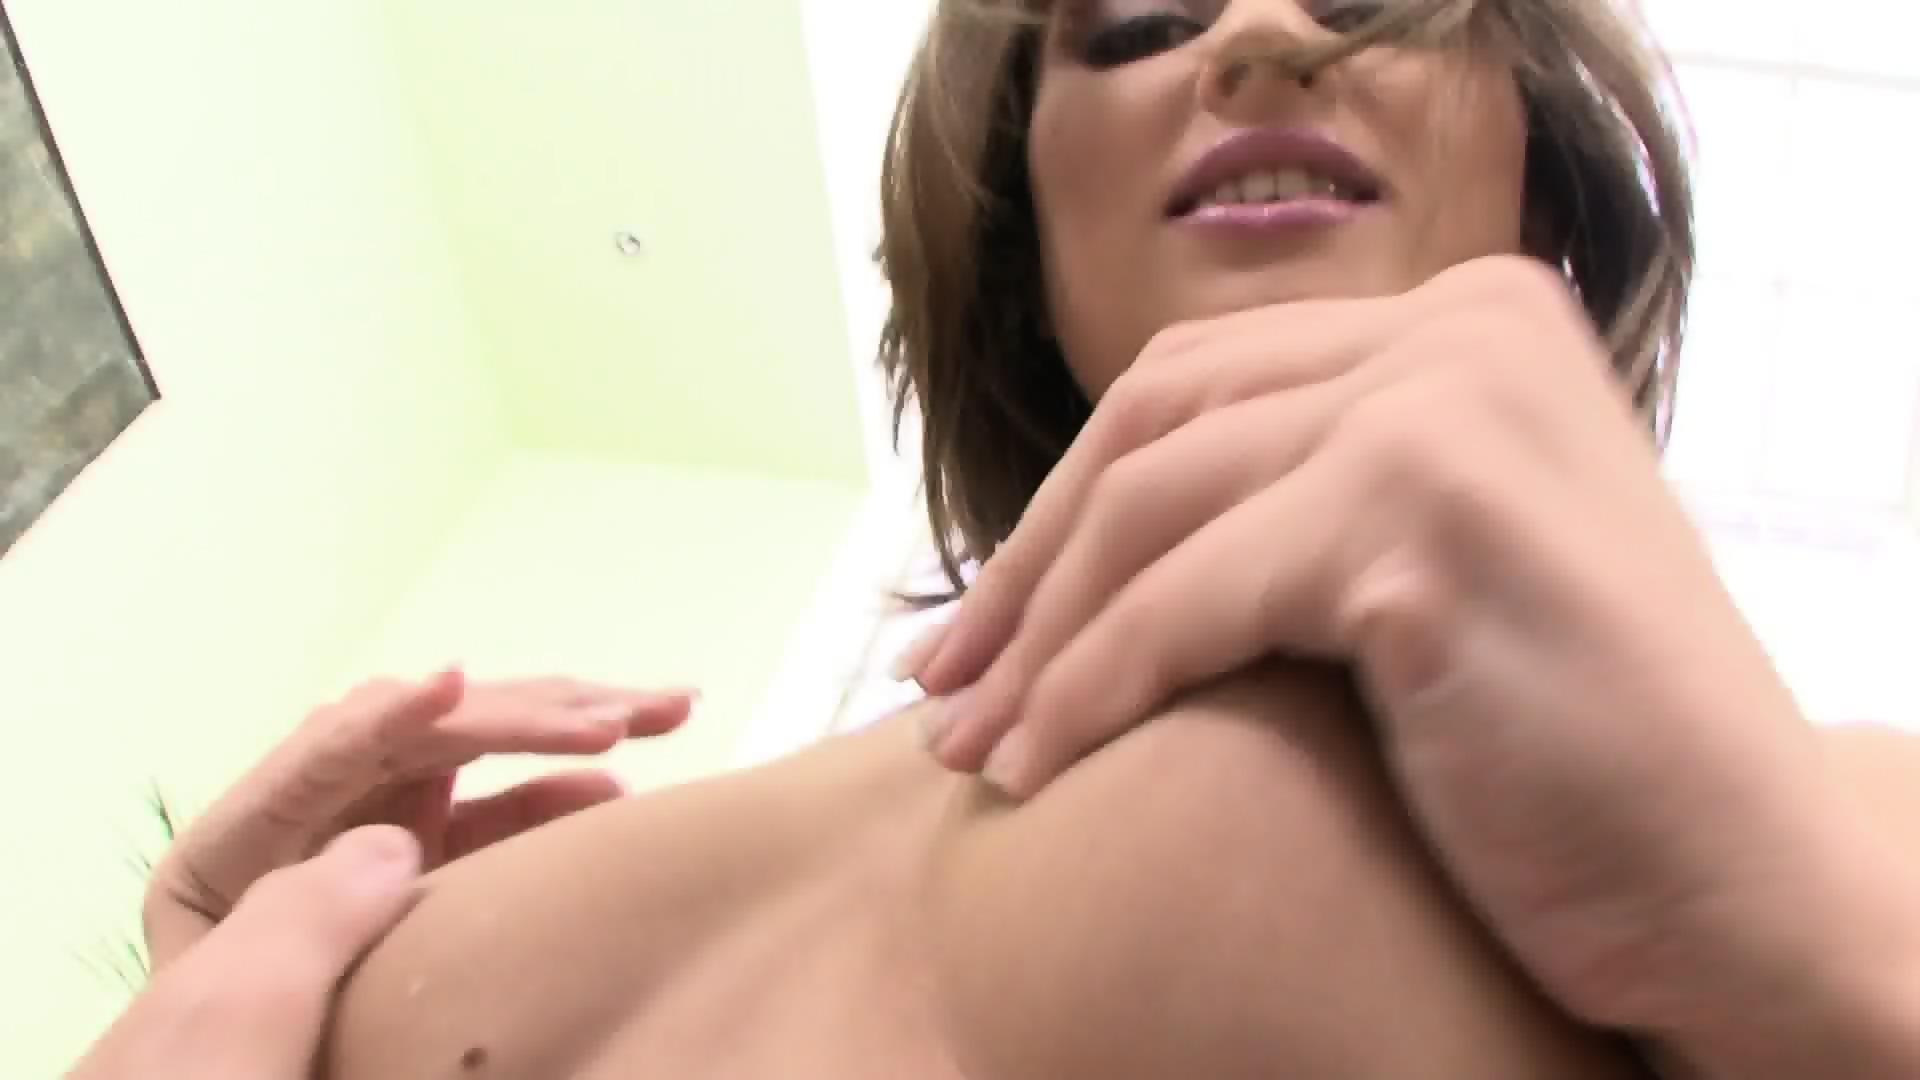 Alice Miller Free Porn Movies blowjob, titjob and anal fun - alice miller - eporner